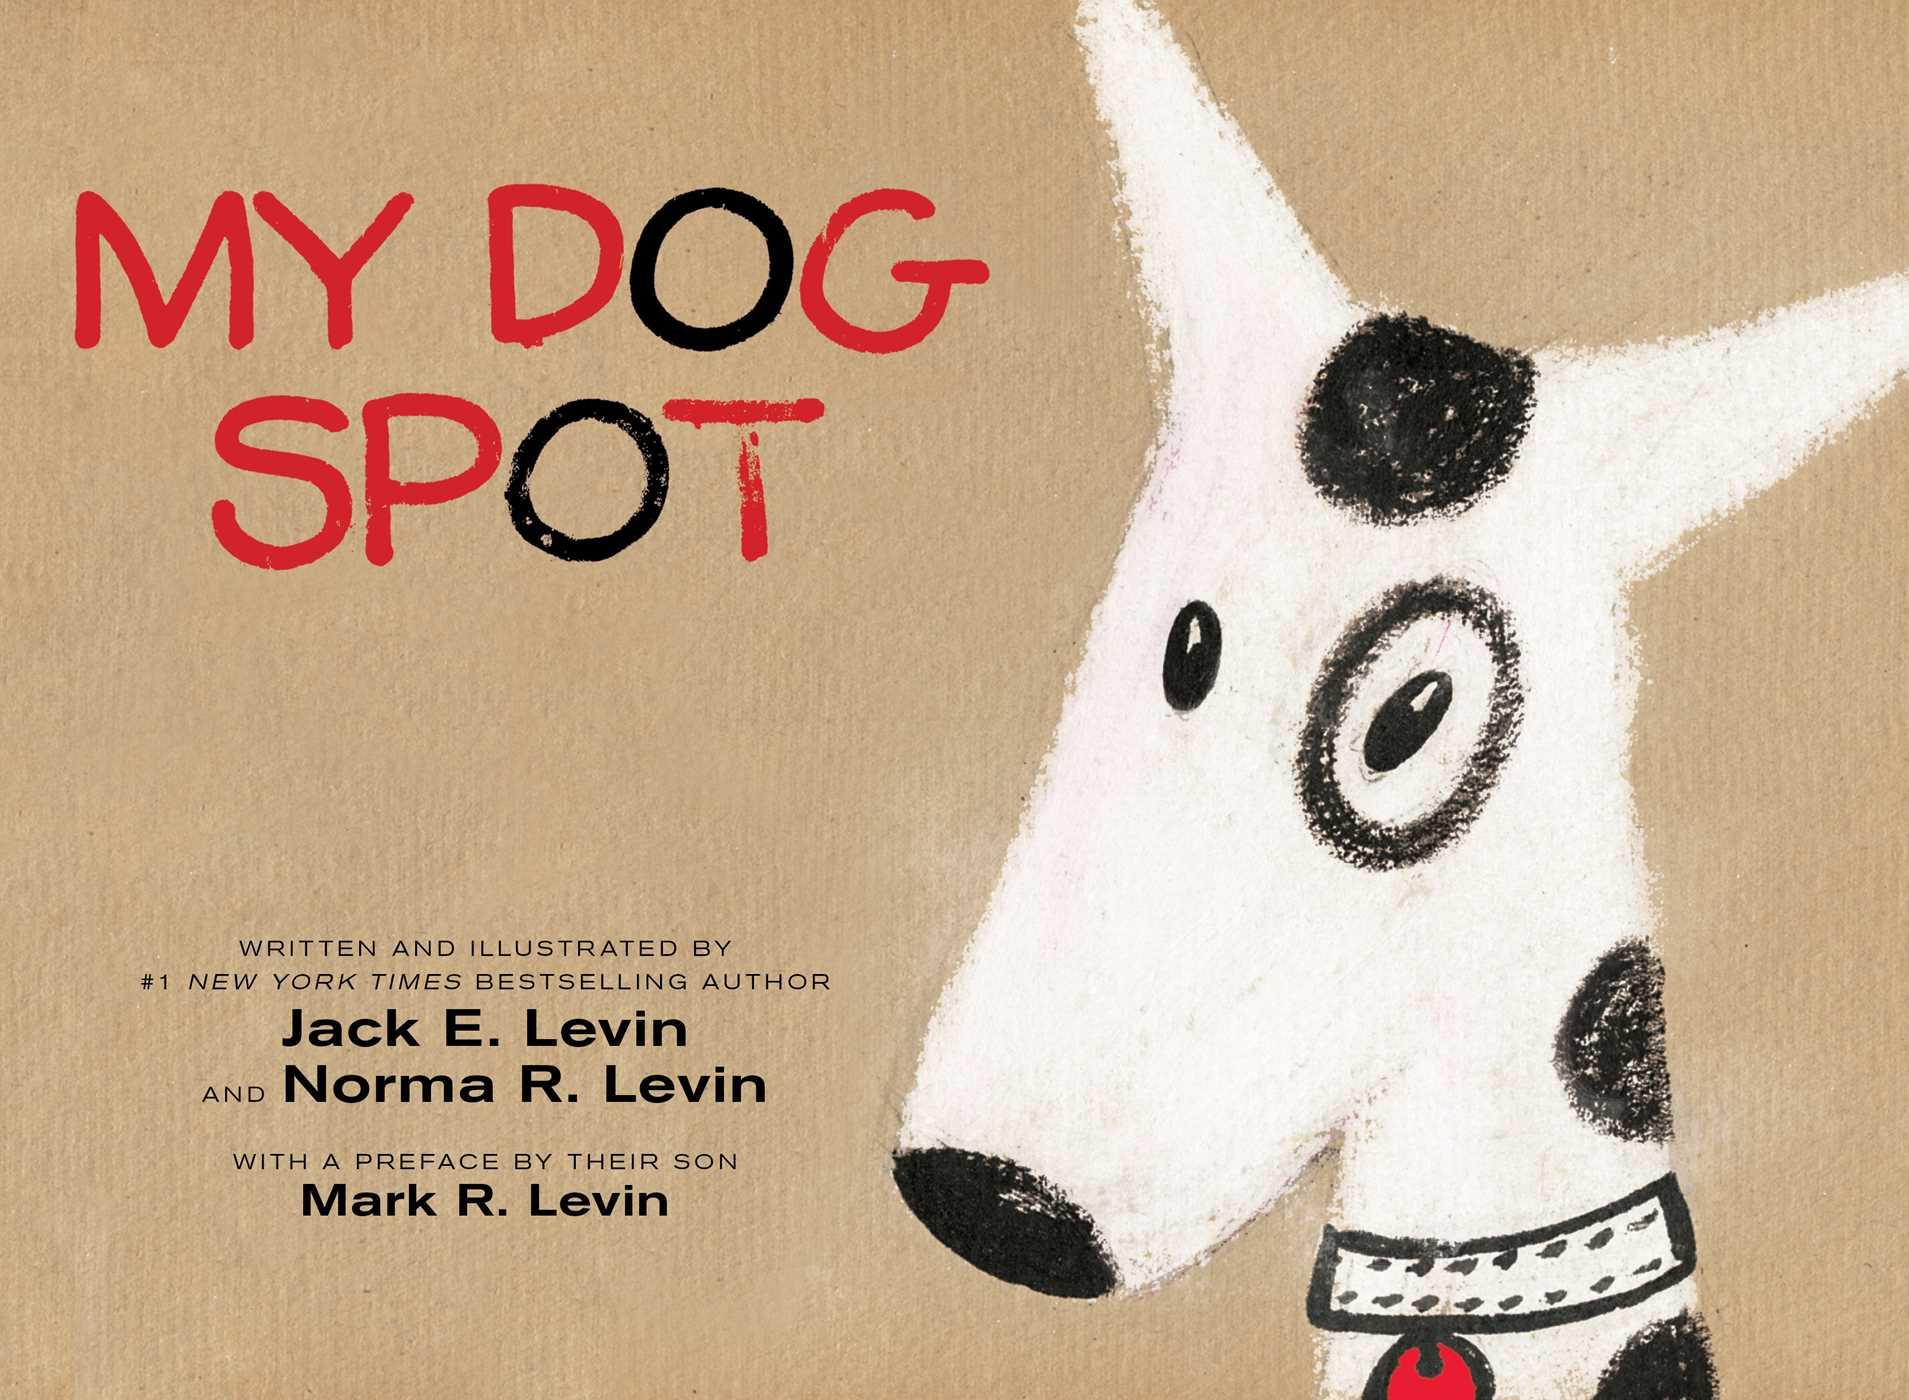 My dog spot 9781481469074 hr